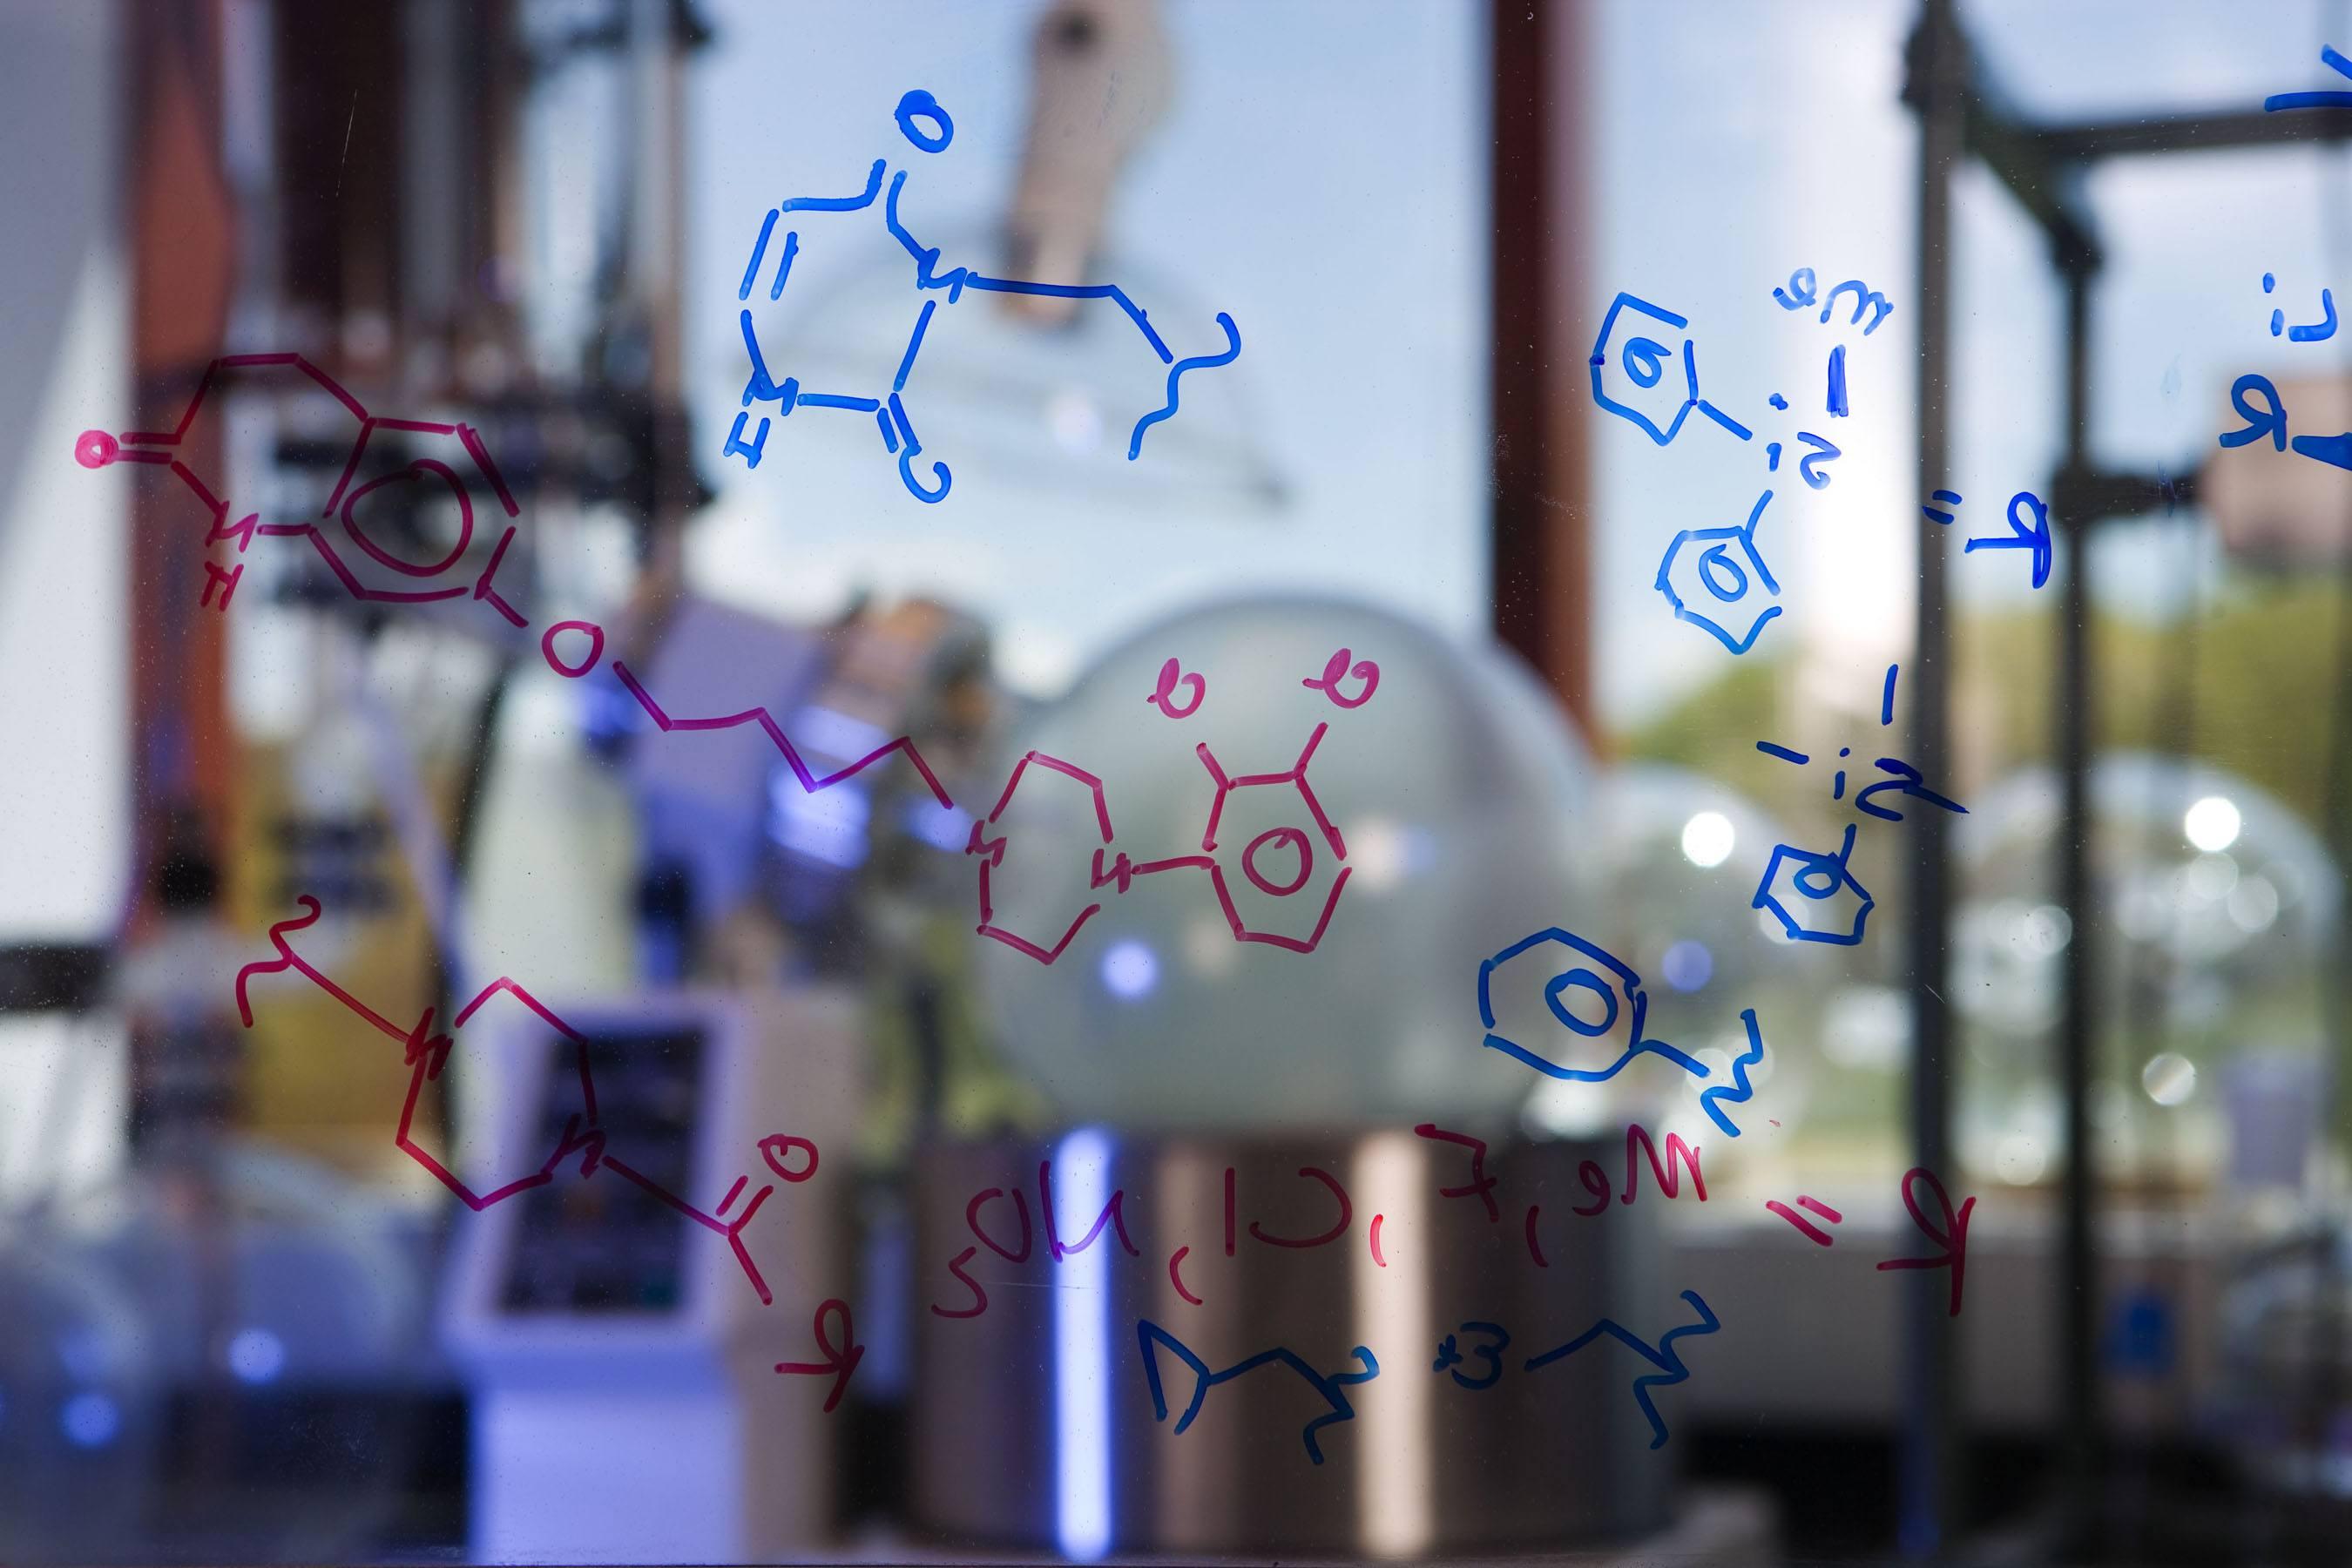 Chemical formulas written on glass